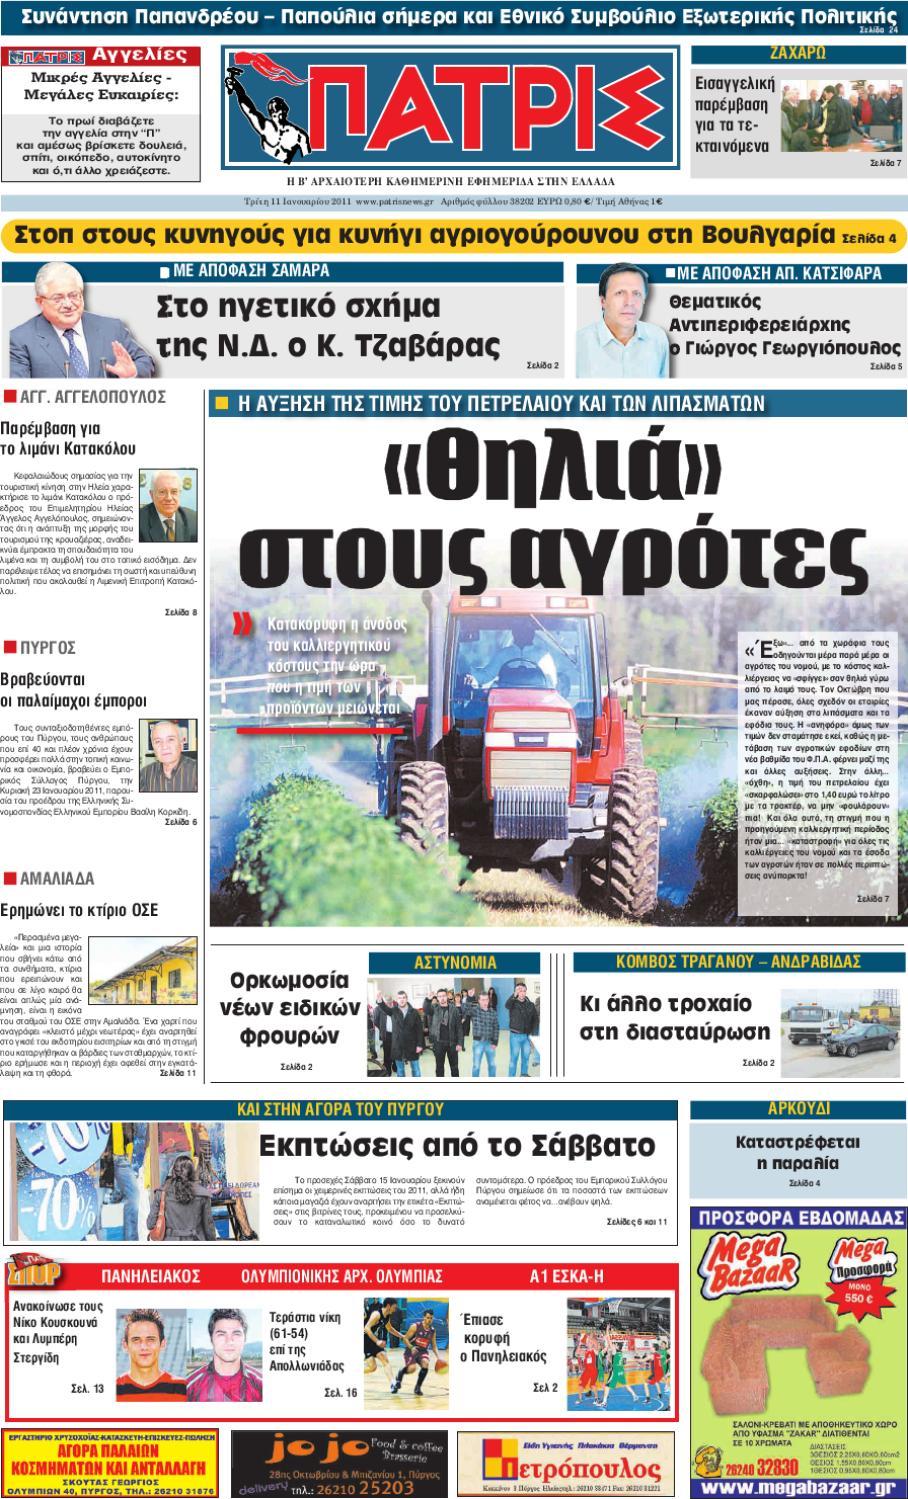 patris news by ΔΗΜΟΣΙΟΓΡΑΦΙΚΟΣ ΟΡΓΑΝΙΣΜΟΣ ΒΑΡΟΥΞΗ - issuu 421a12595c2